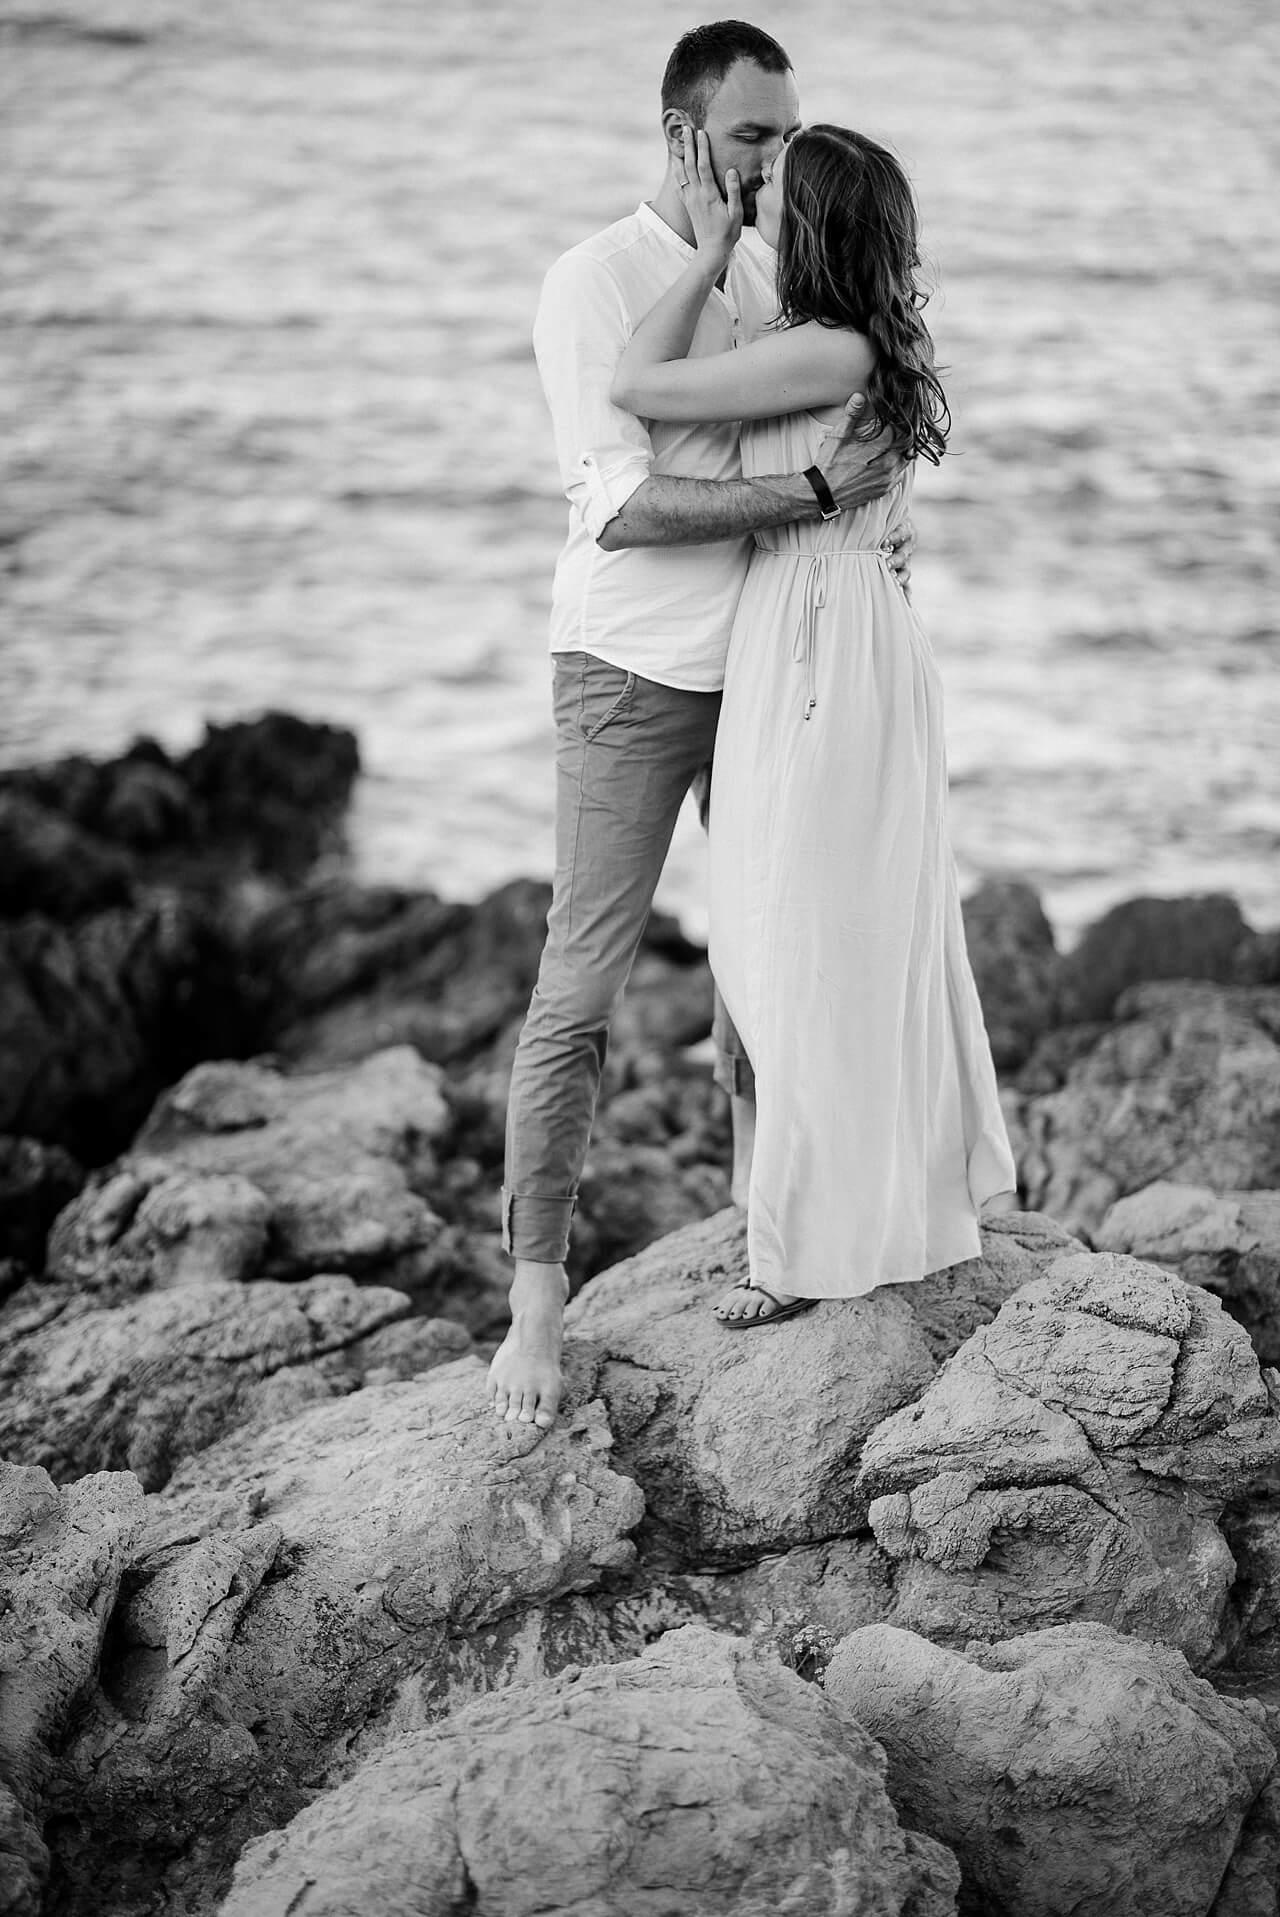 Rebecca Conte Fotografie: Paaraufnahmen auf Mallorca 16